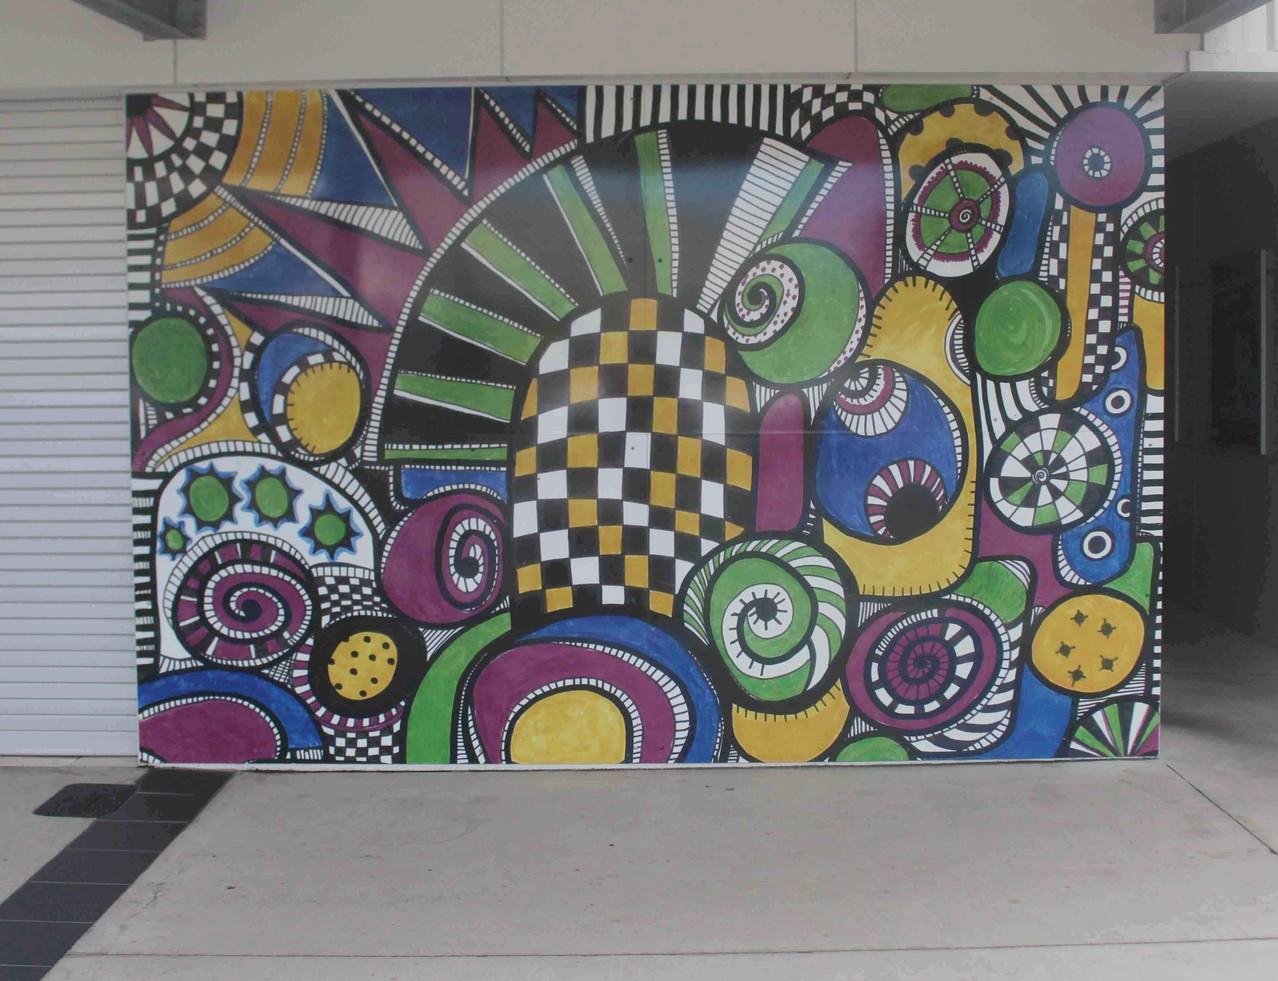 coles carpark2 - 2011